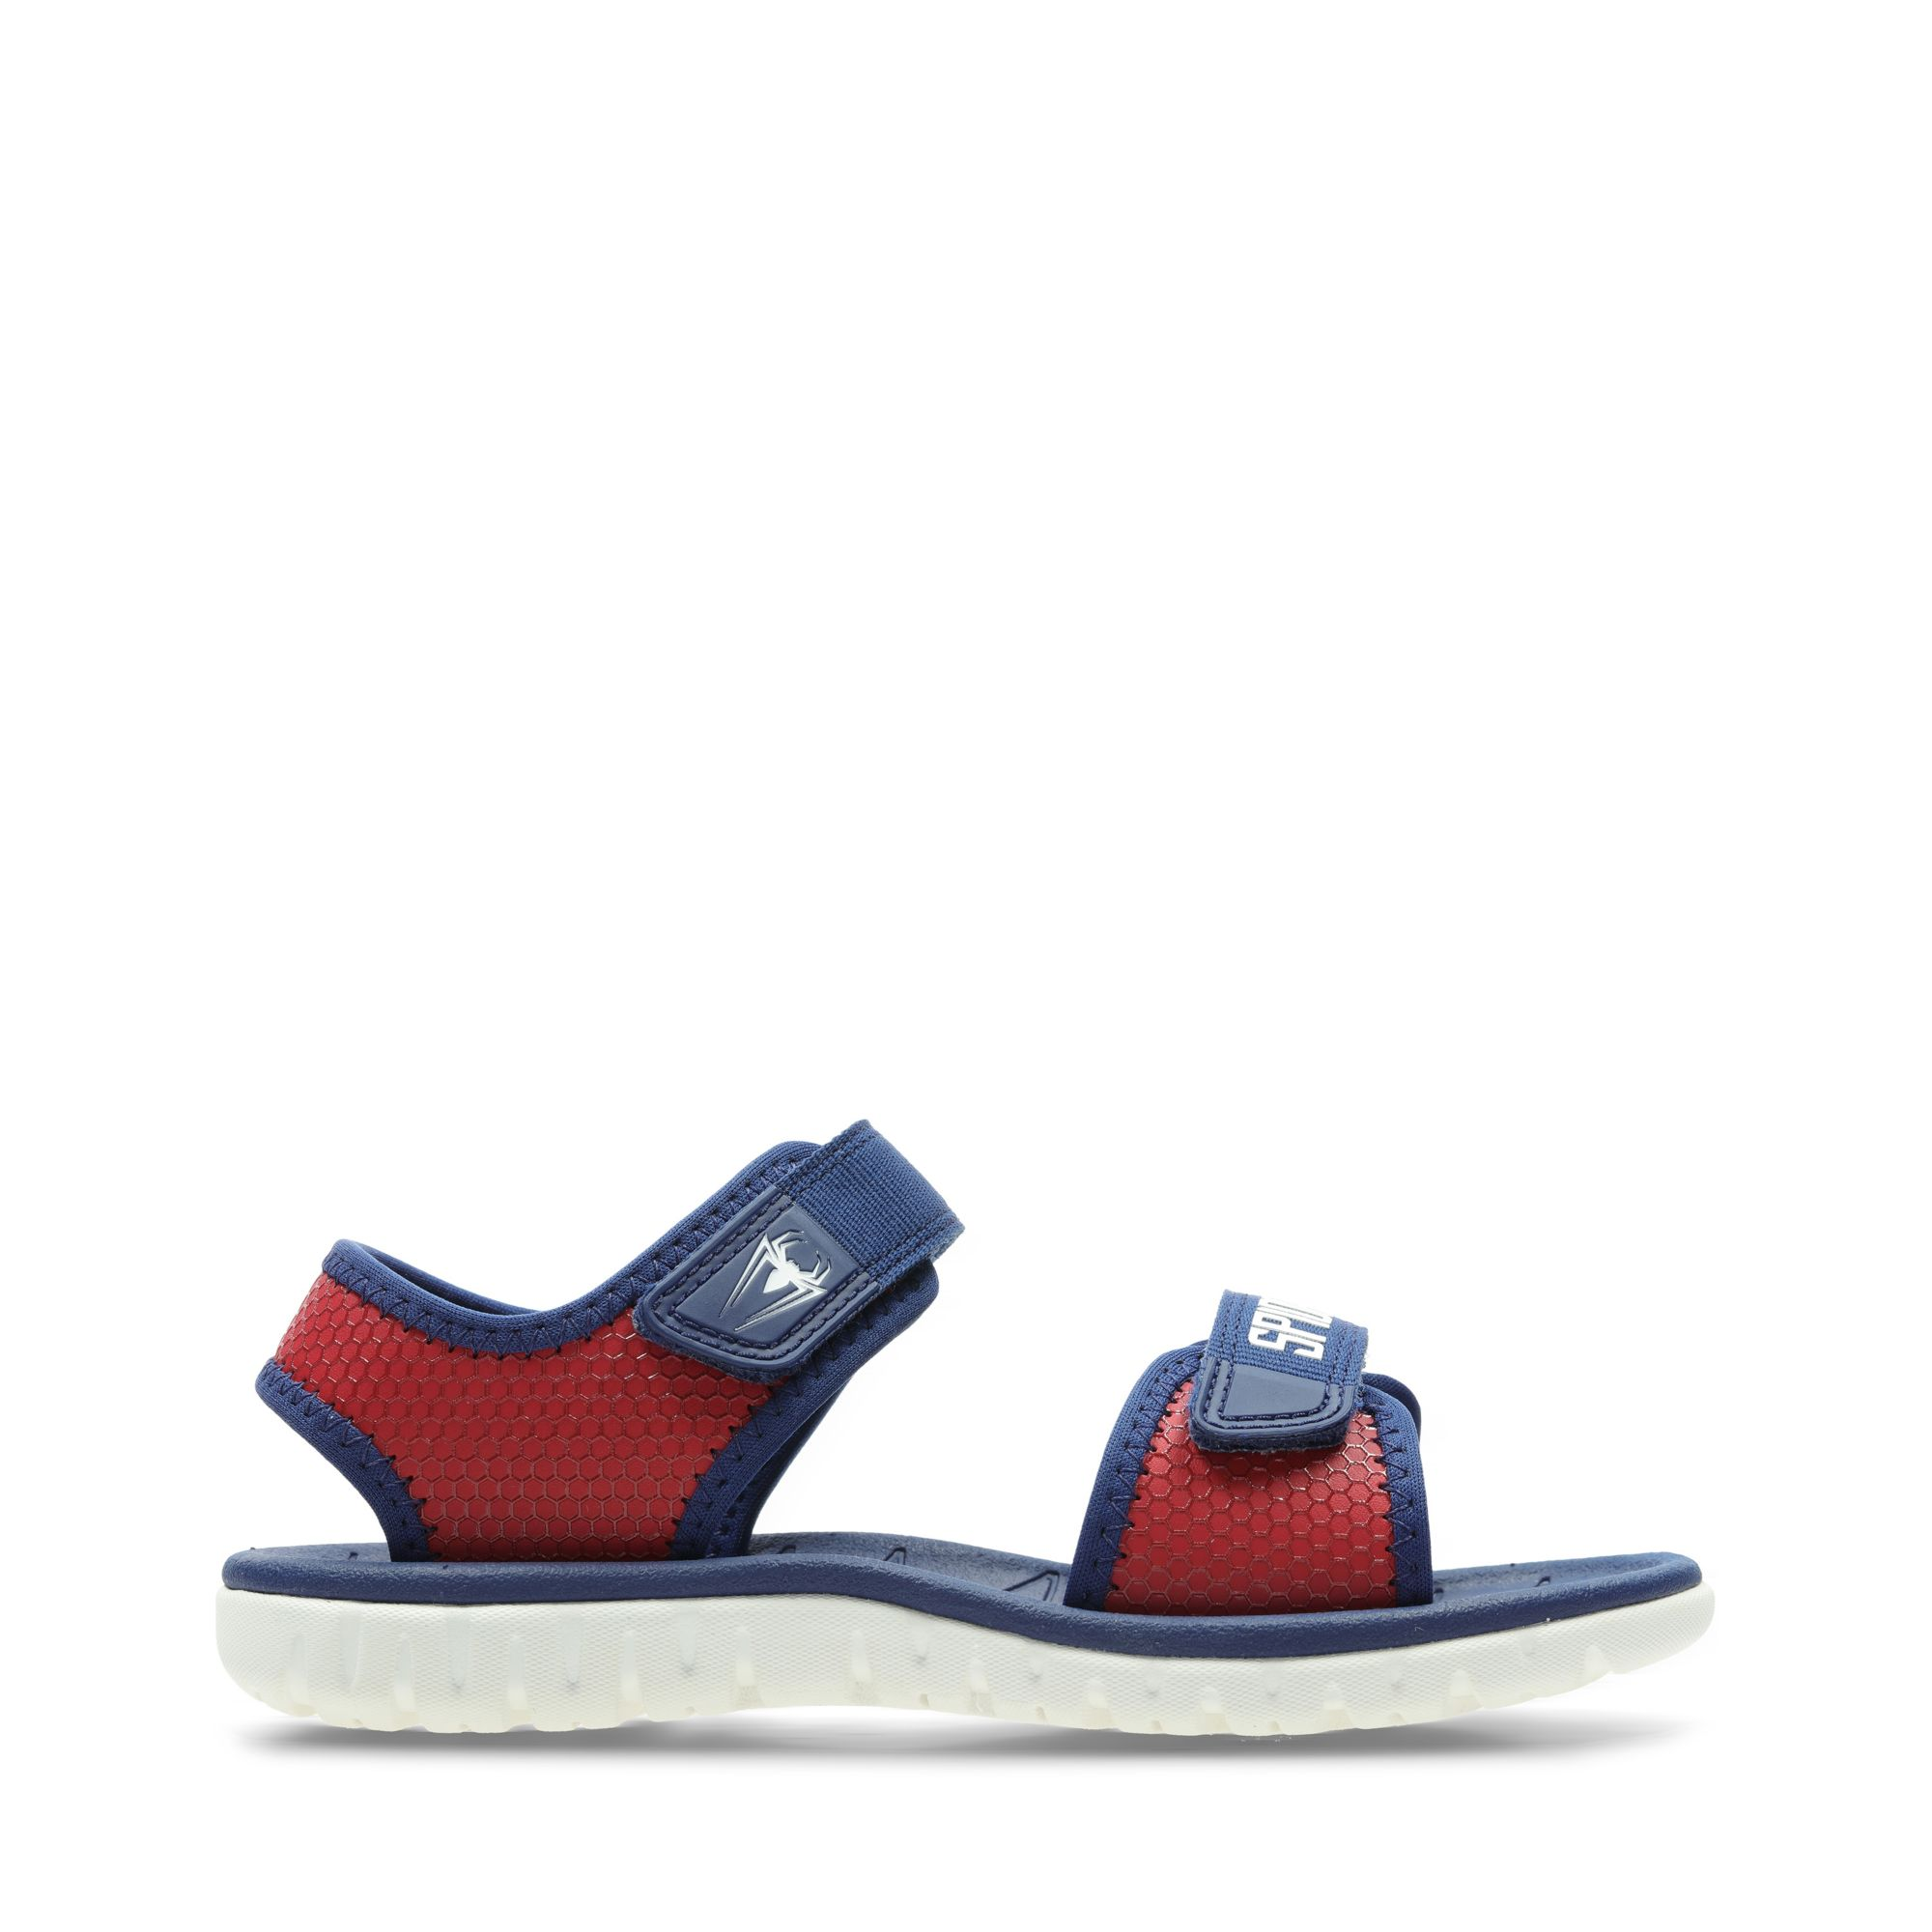 Clarks Coupon: 40% Off: Toddler or Boys' Surfing Web Sandal $12, Cloud Blaze Kid Leather Shoe $18, Women's Tri Sara Sandal $18, More + FS